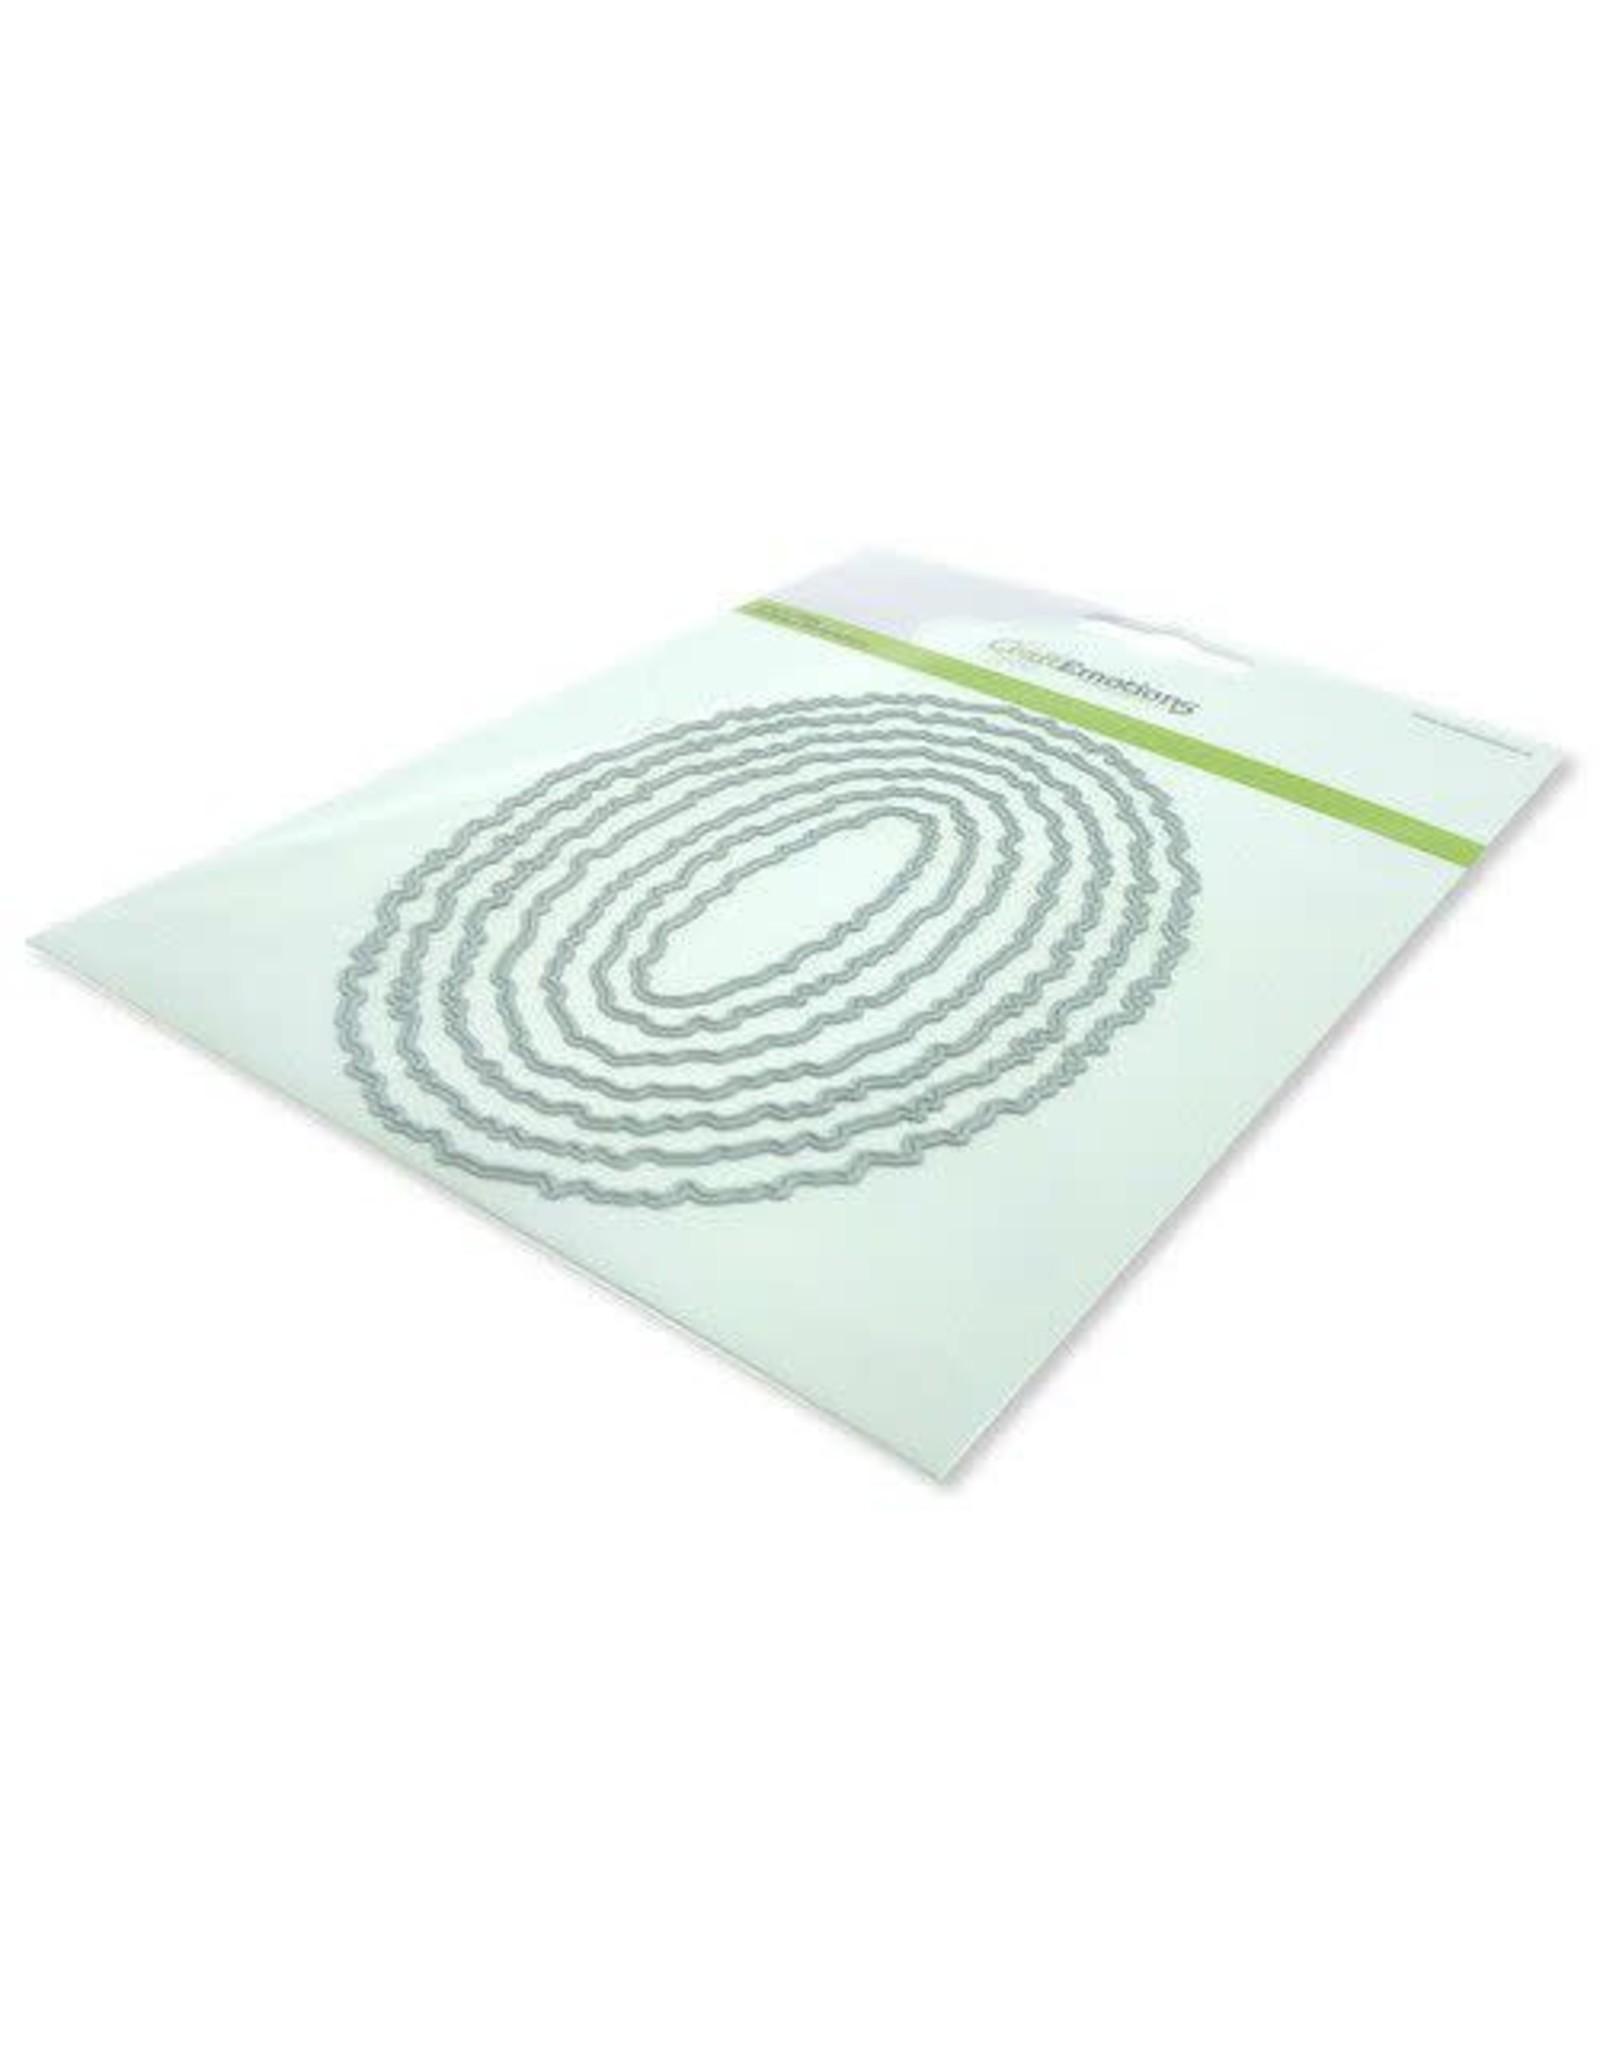 Craft Emotions CraftEmotions Big Nesting Die - deckle ovalen Card 150x160 - 10,5x15cm